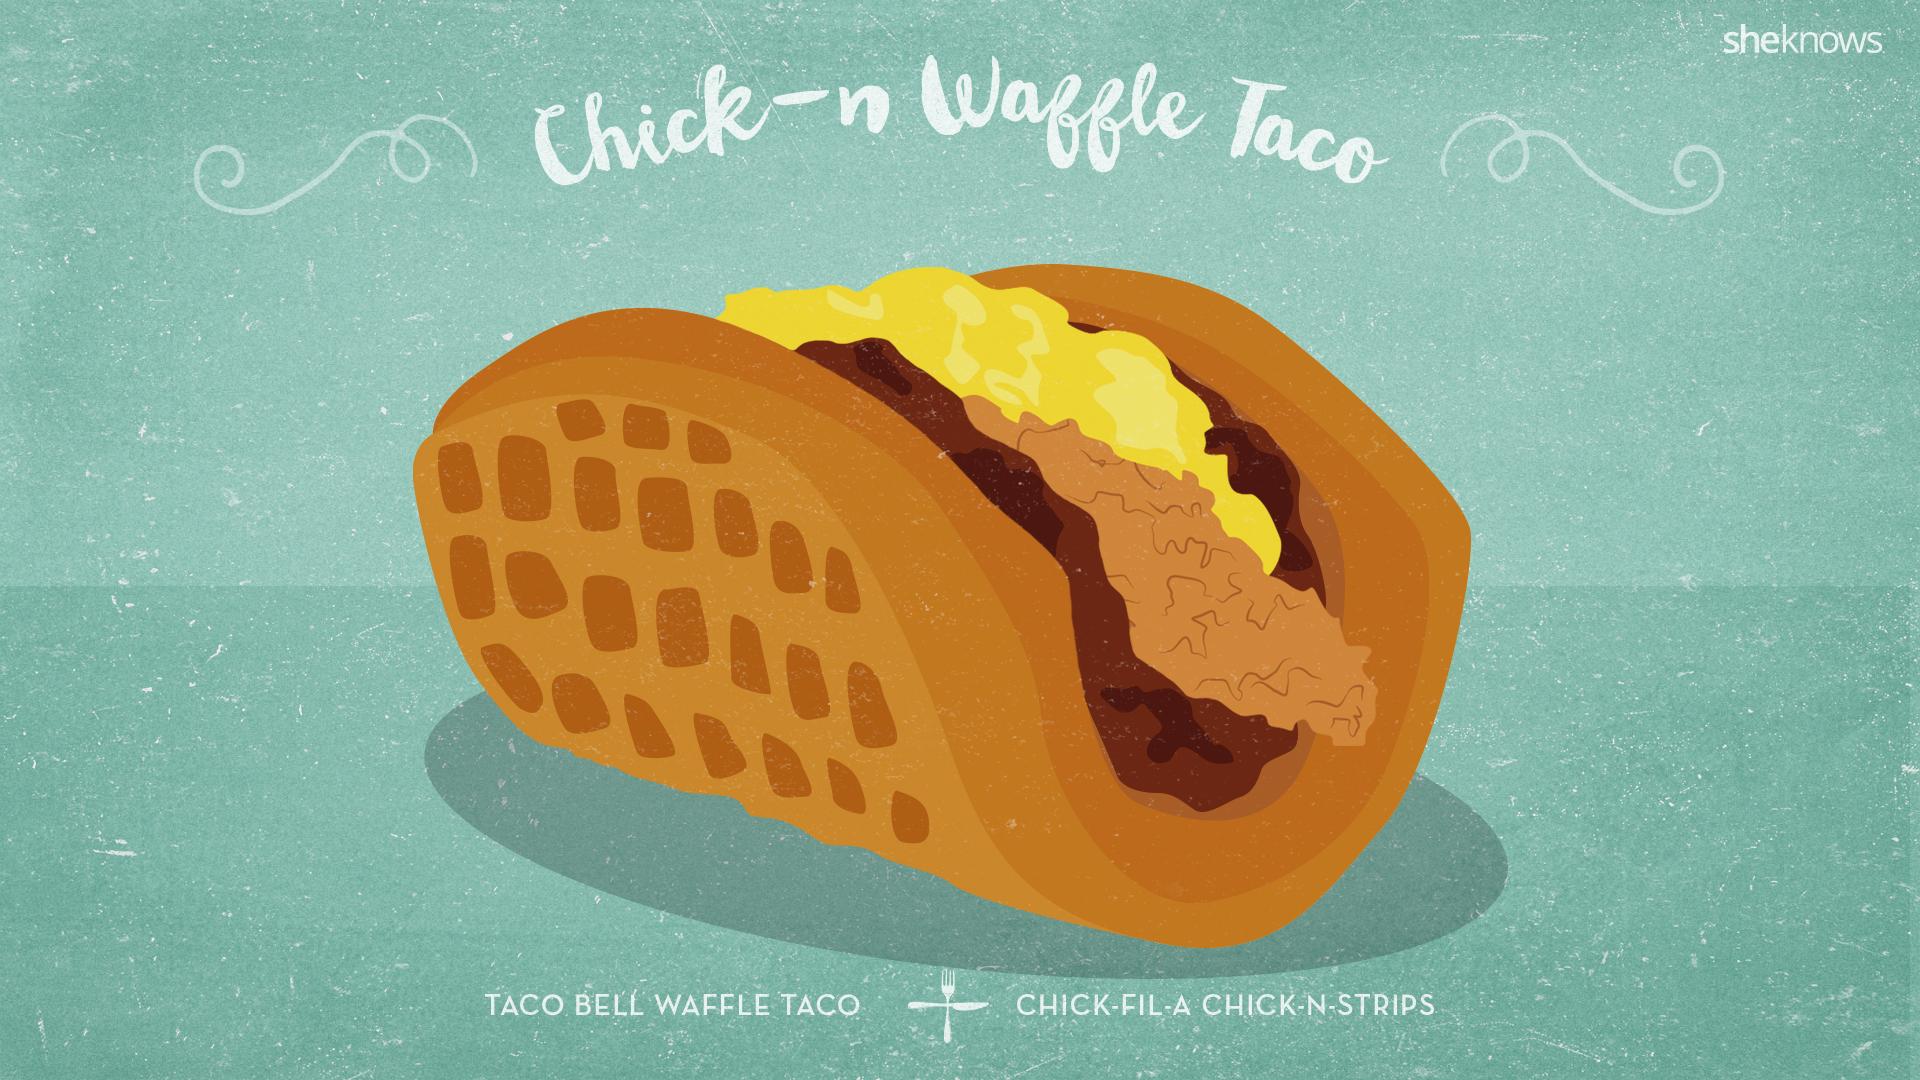 chick-n waffle taco